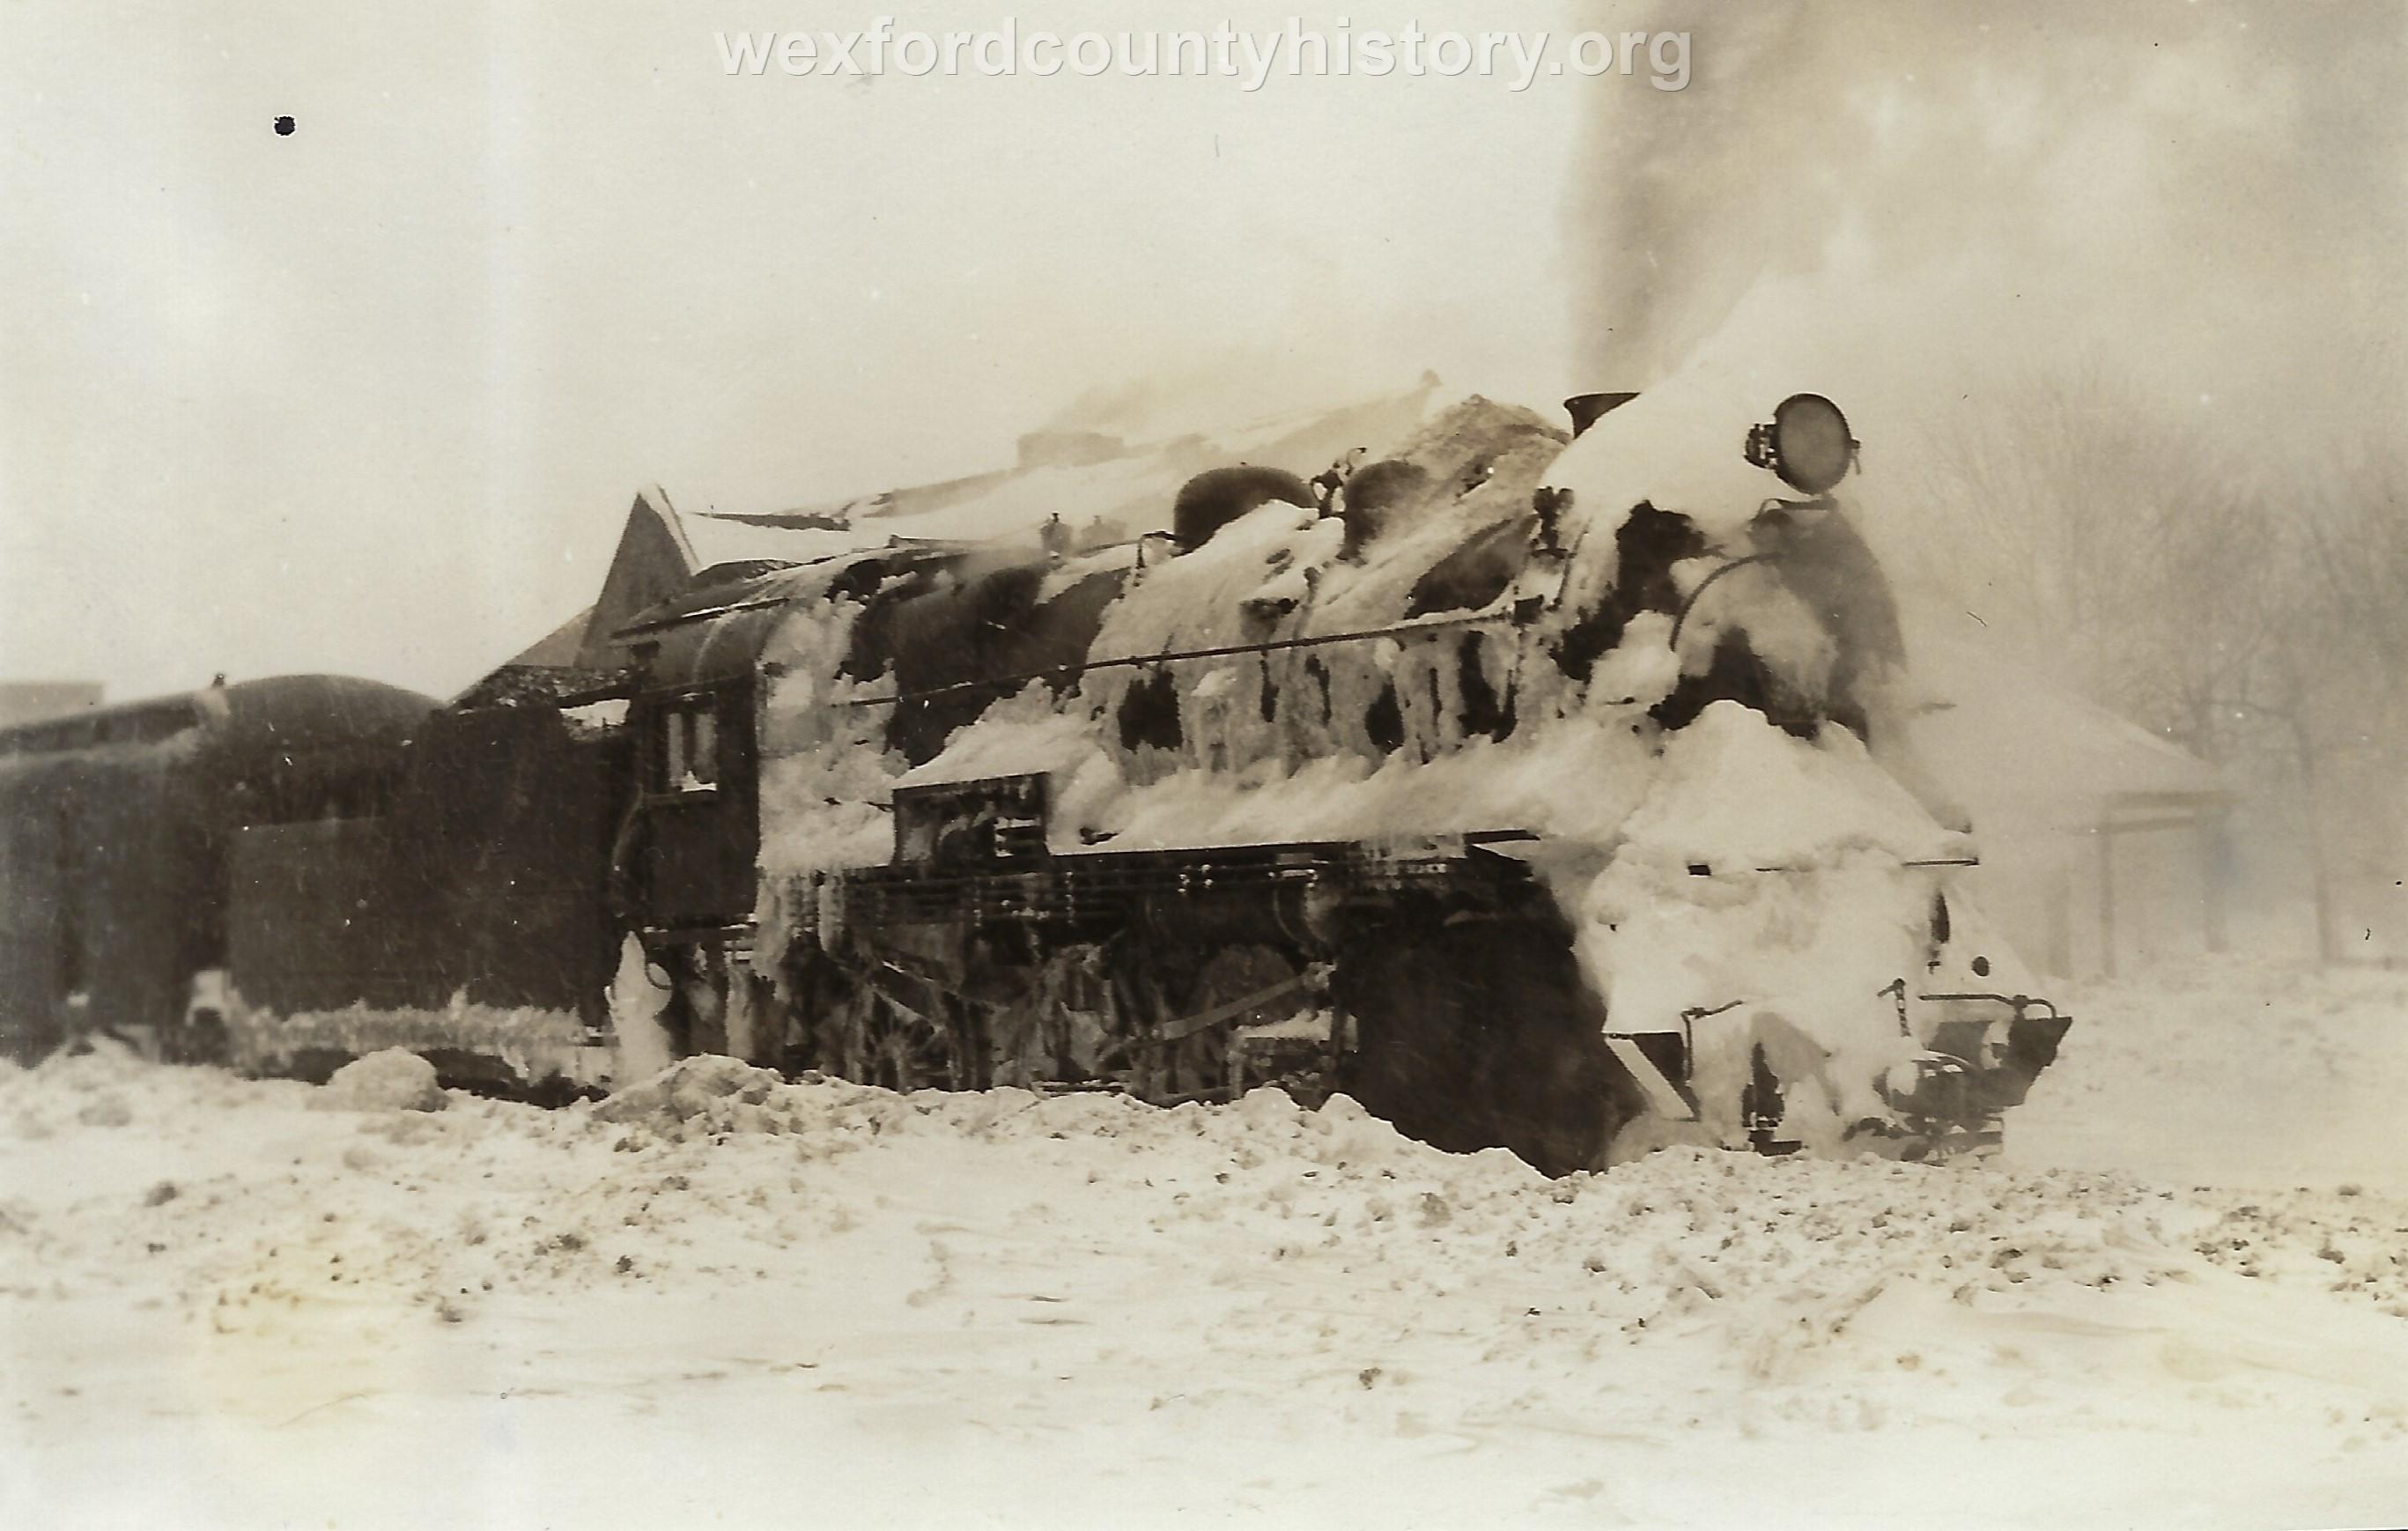 Cadillac-Railroad-Locomotive-In-Winter